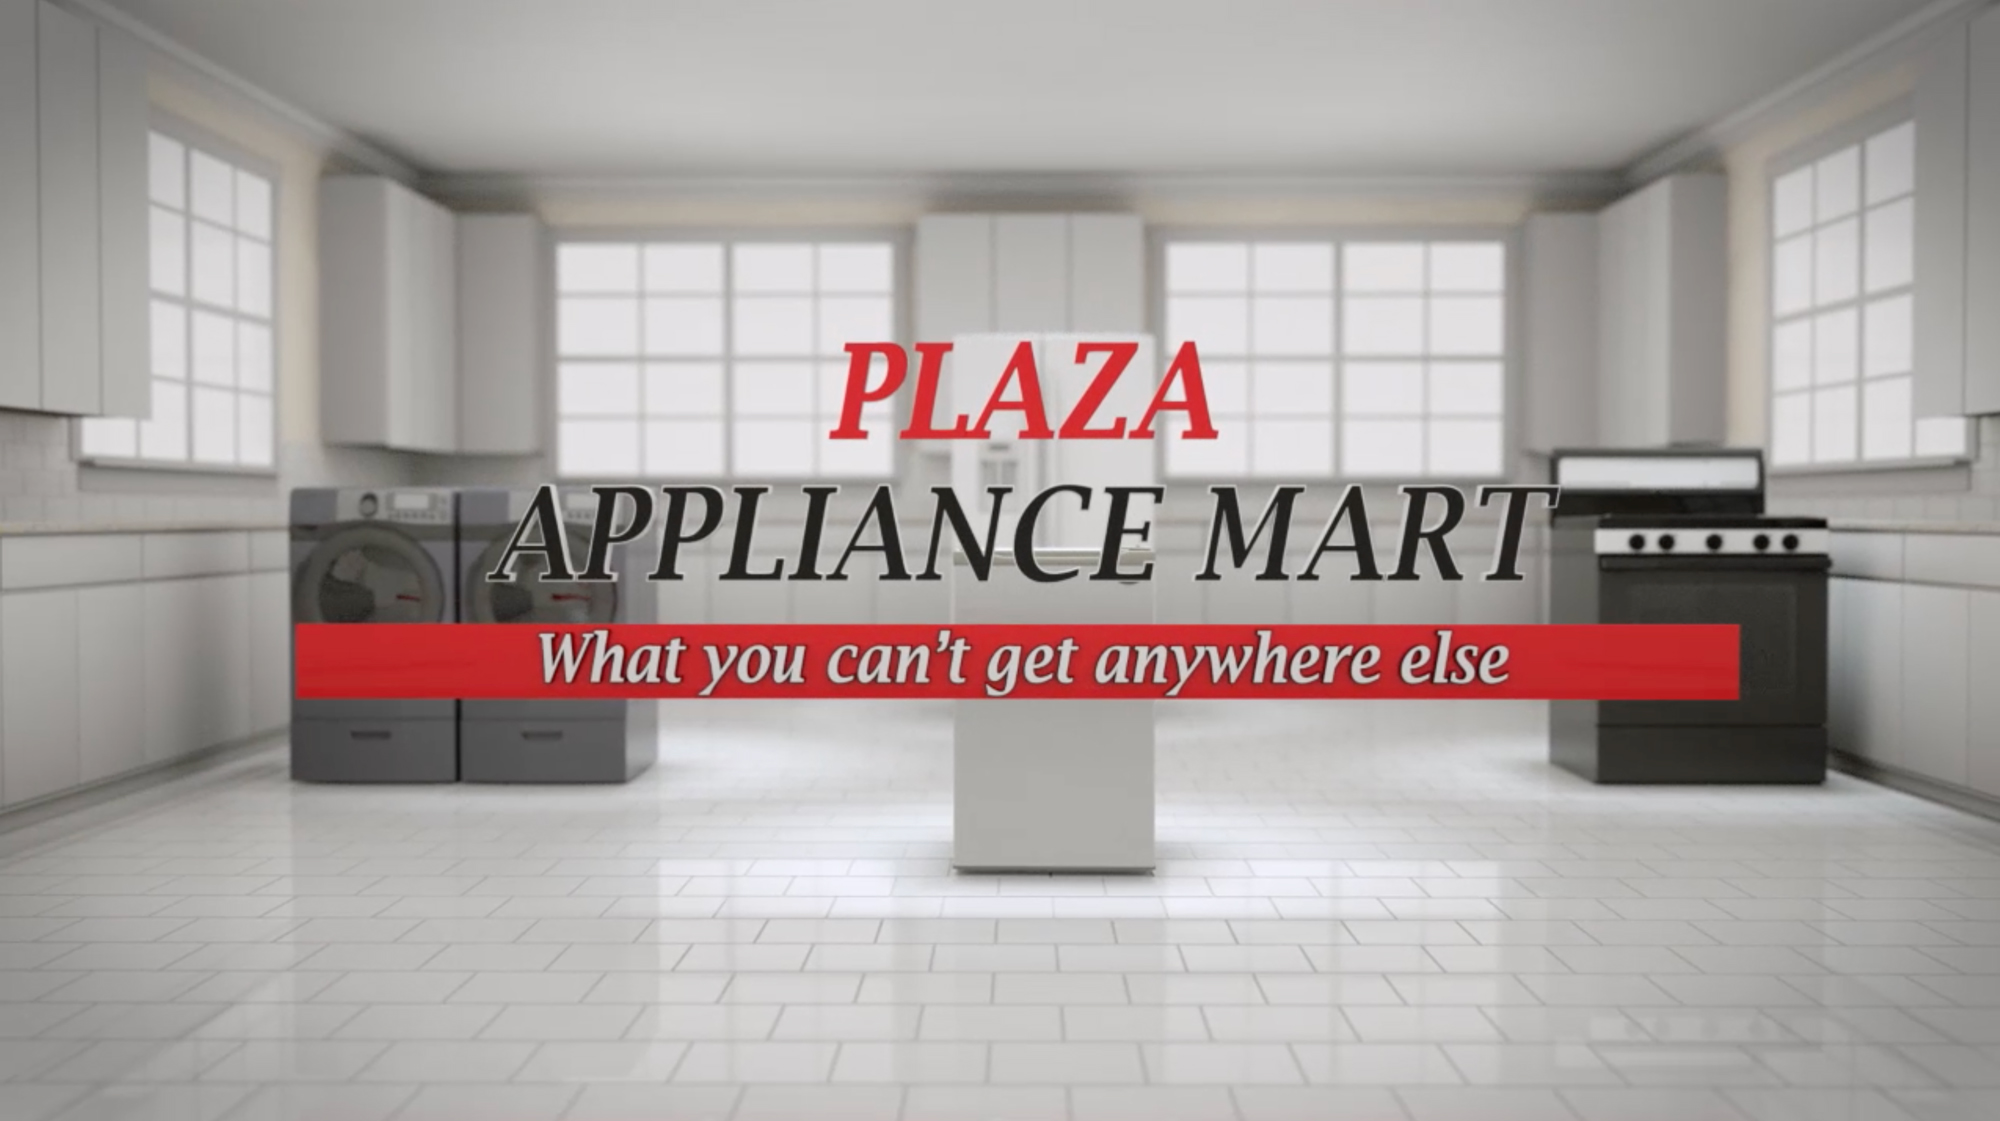 Plaza Appliance Mart Home Appliances Mattress in Charlotte